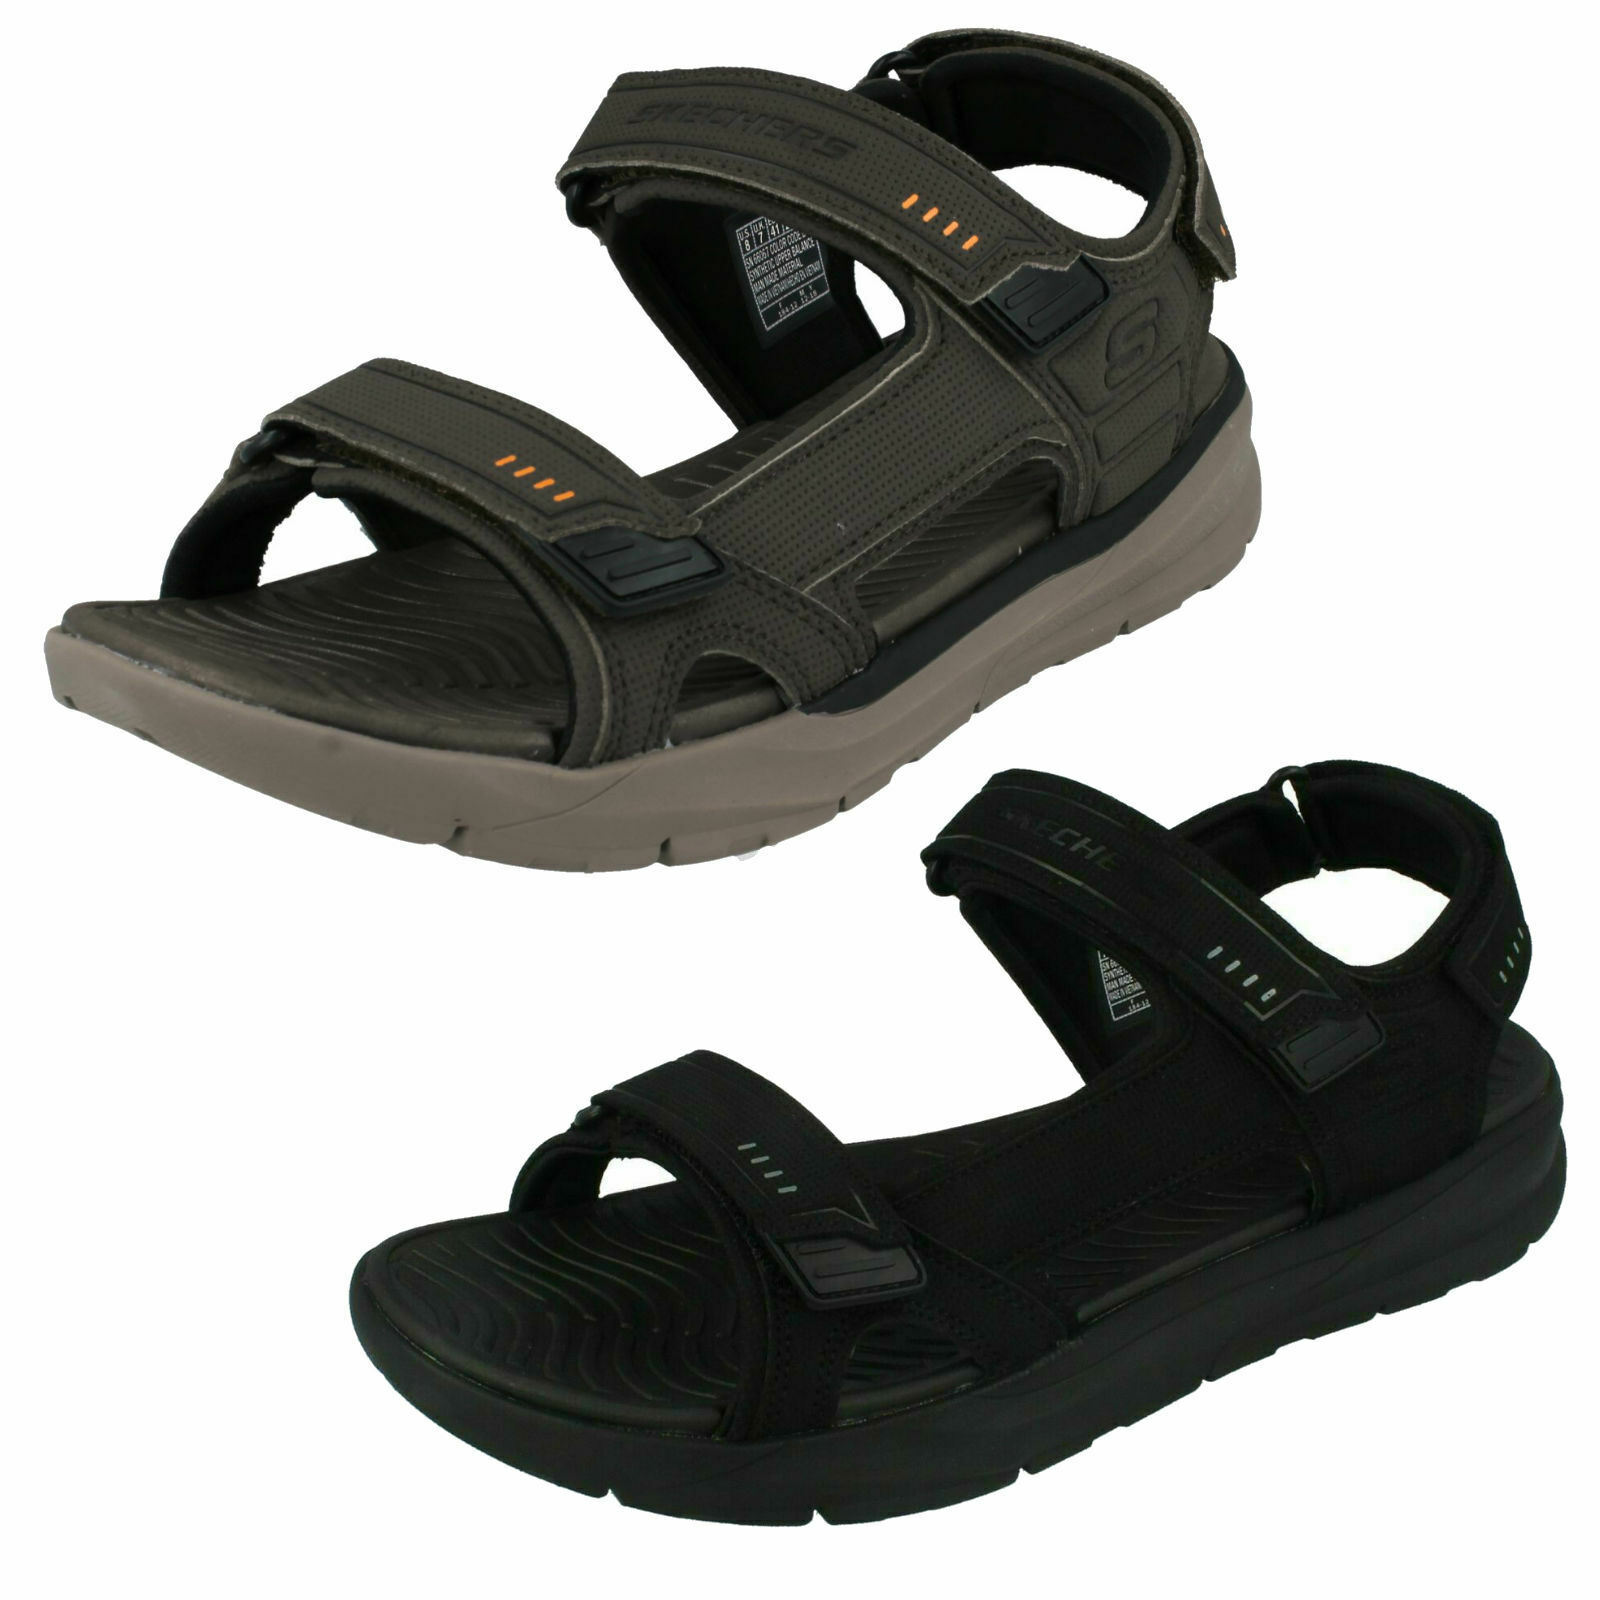 Skechers Hombre Sandalia - Senco   66067